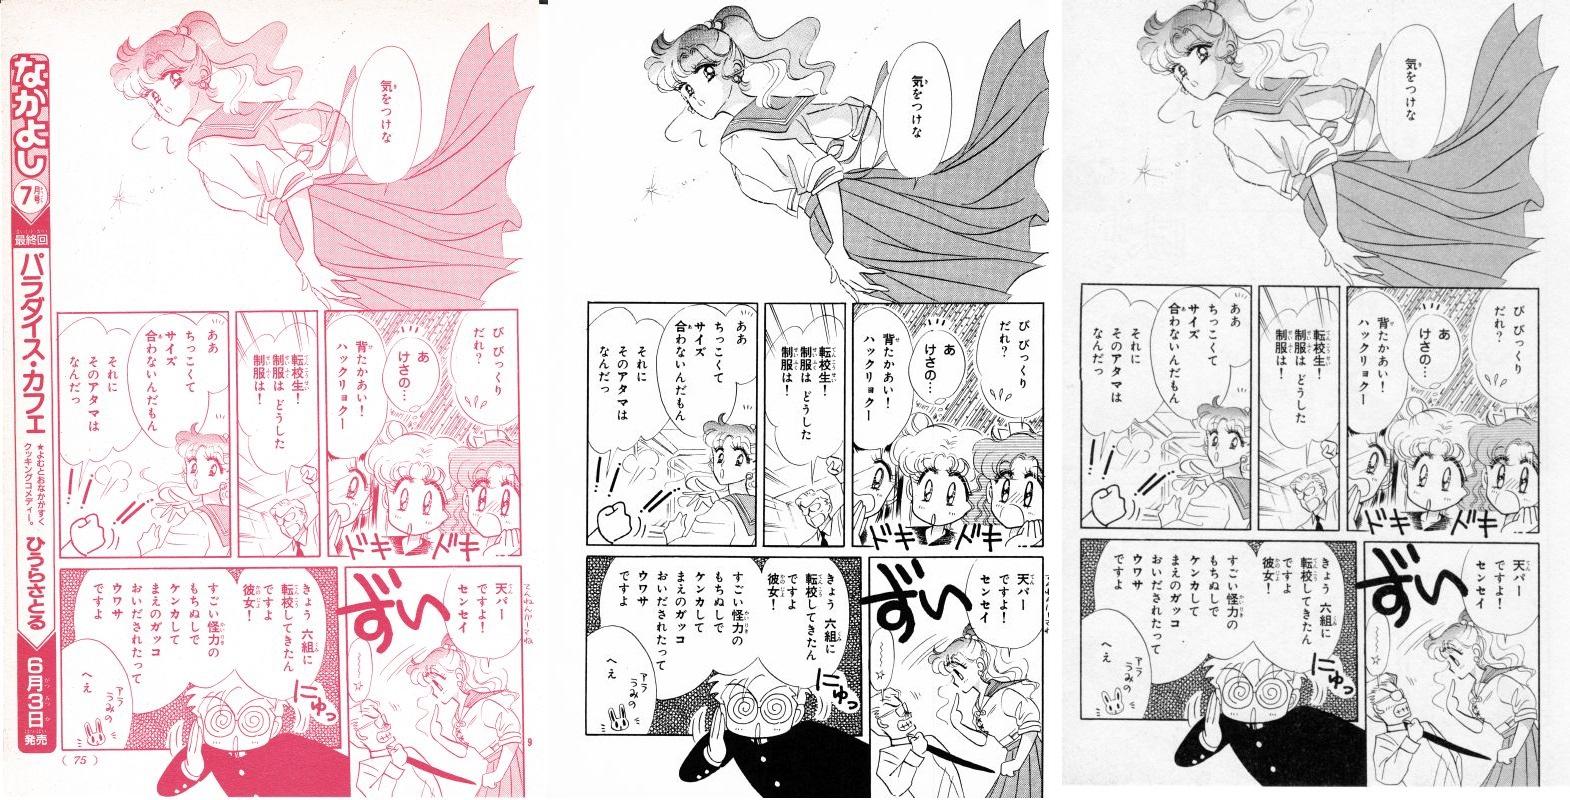 Act 5, Page 7 – Nakayoshi, Original, Remaster